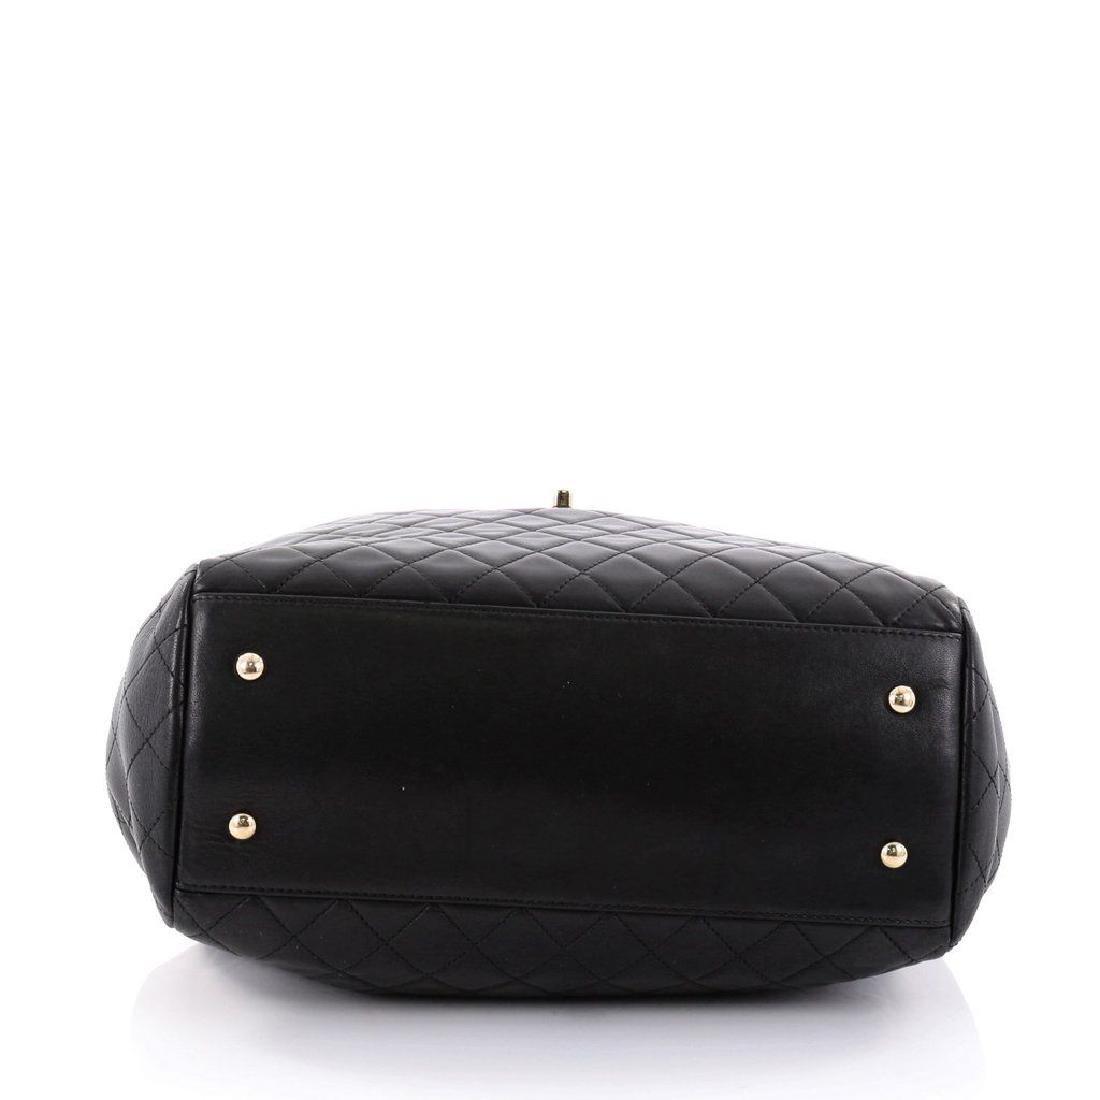 Chanel Lambskin Classic CC Drawstring Black Bucket Bag - 9